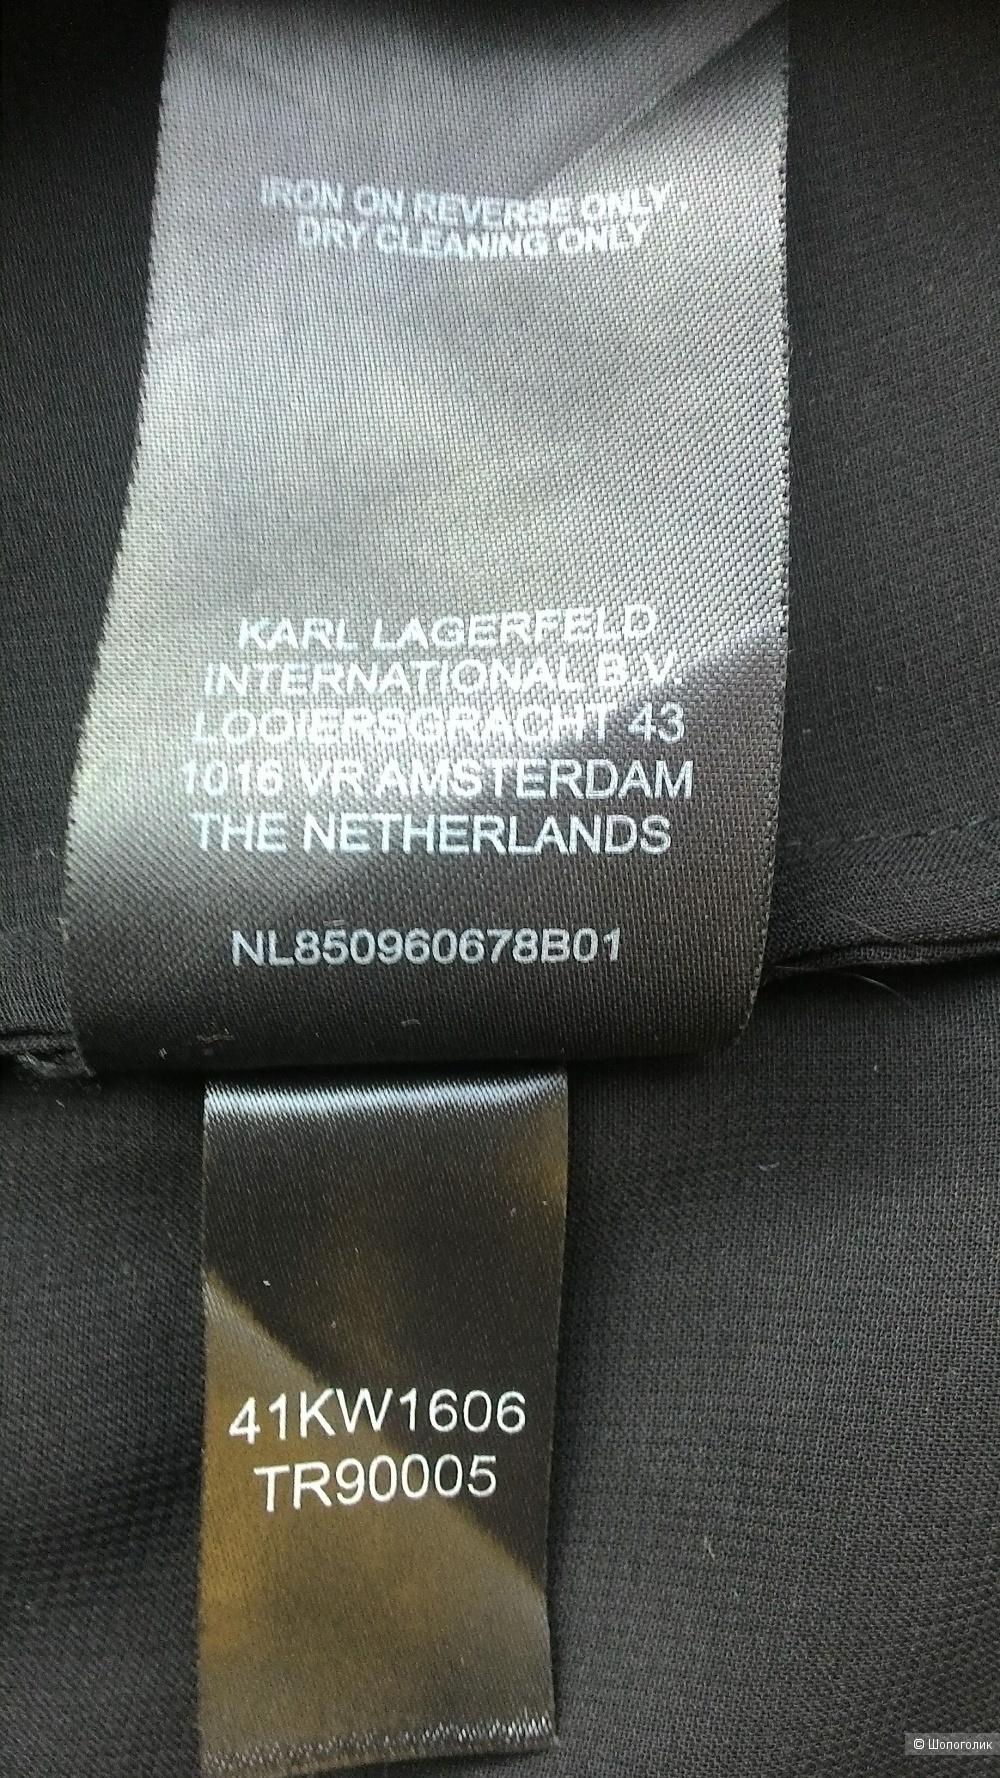 Блузка Karl Lagerfeld for H&M, размер XS